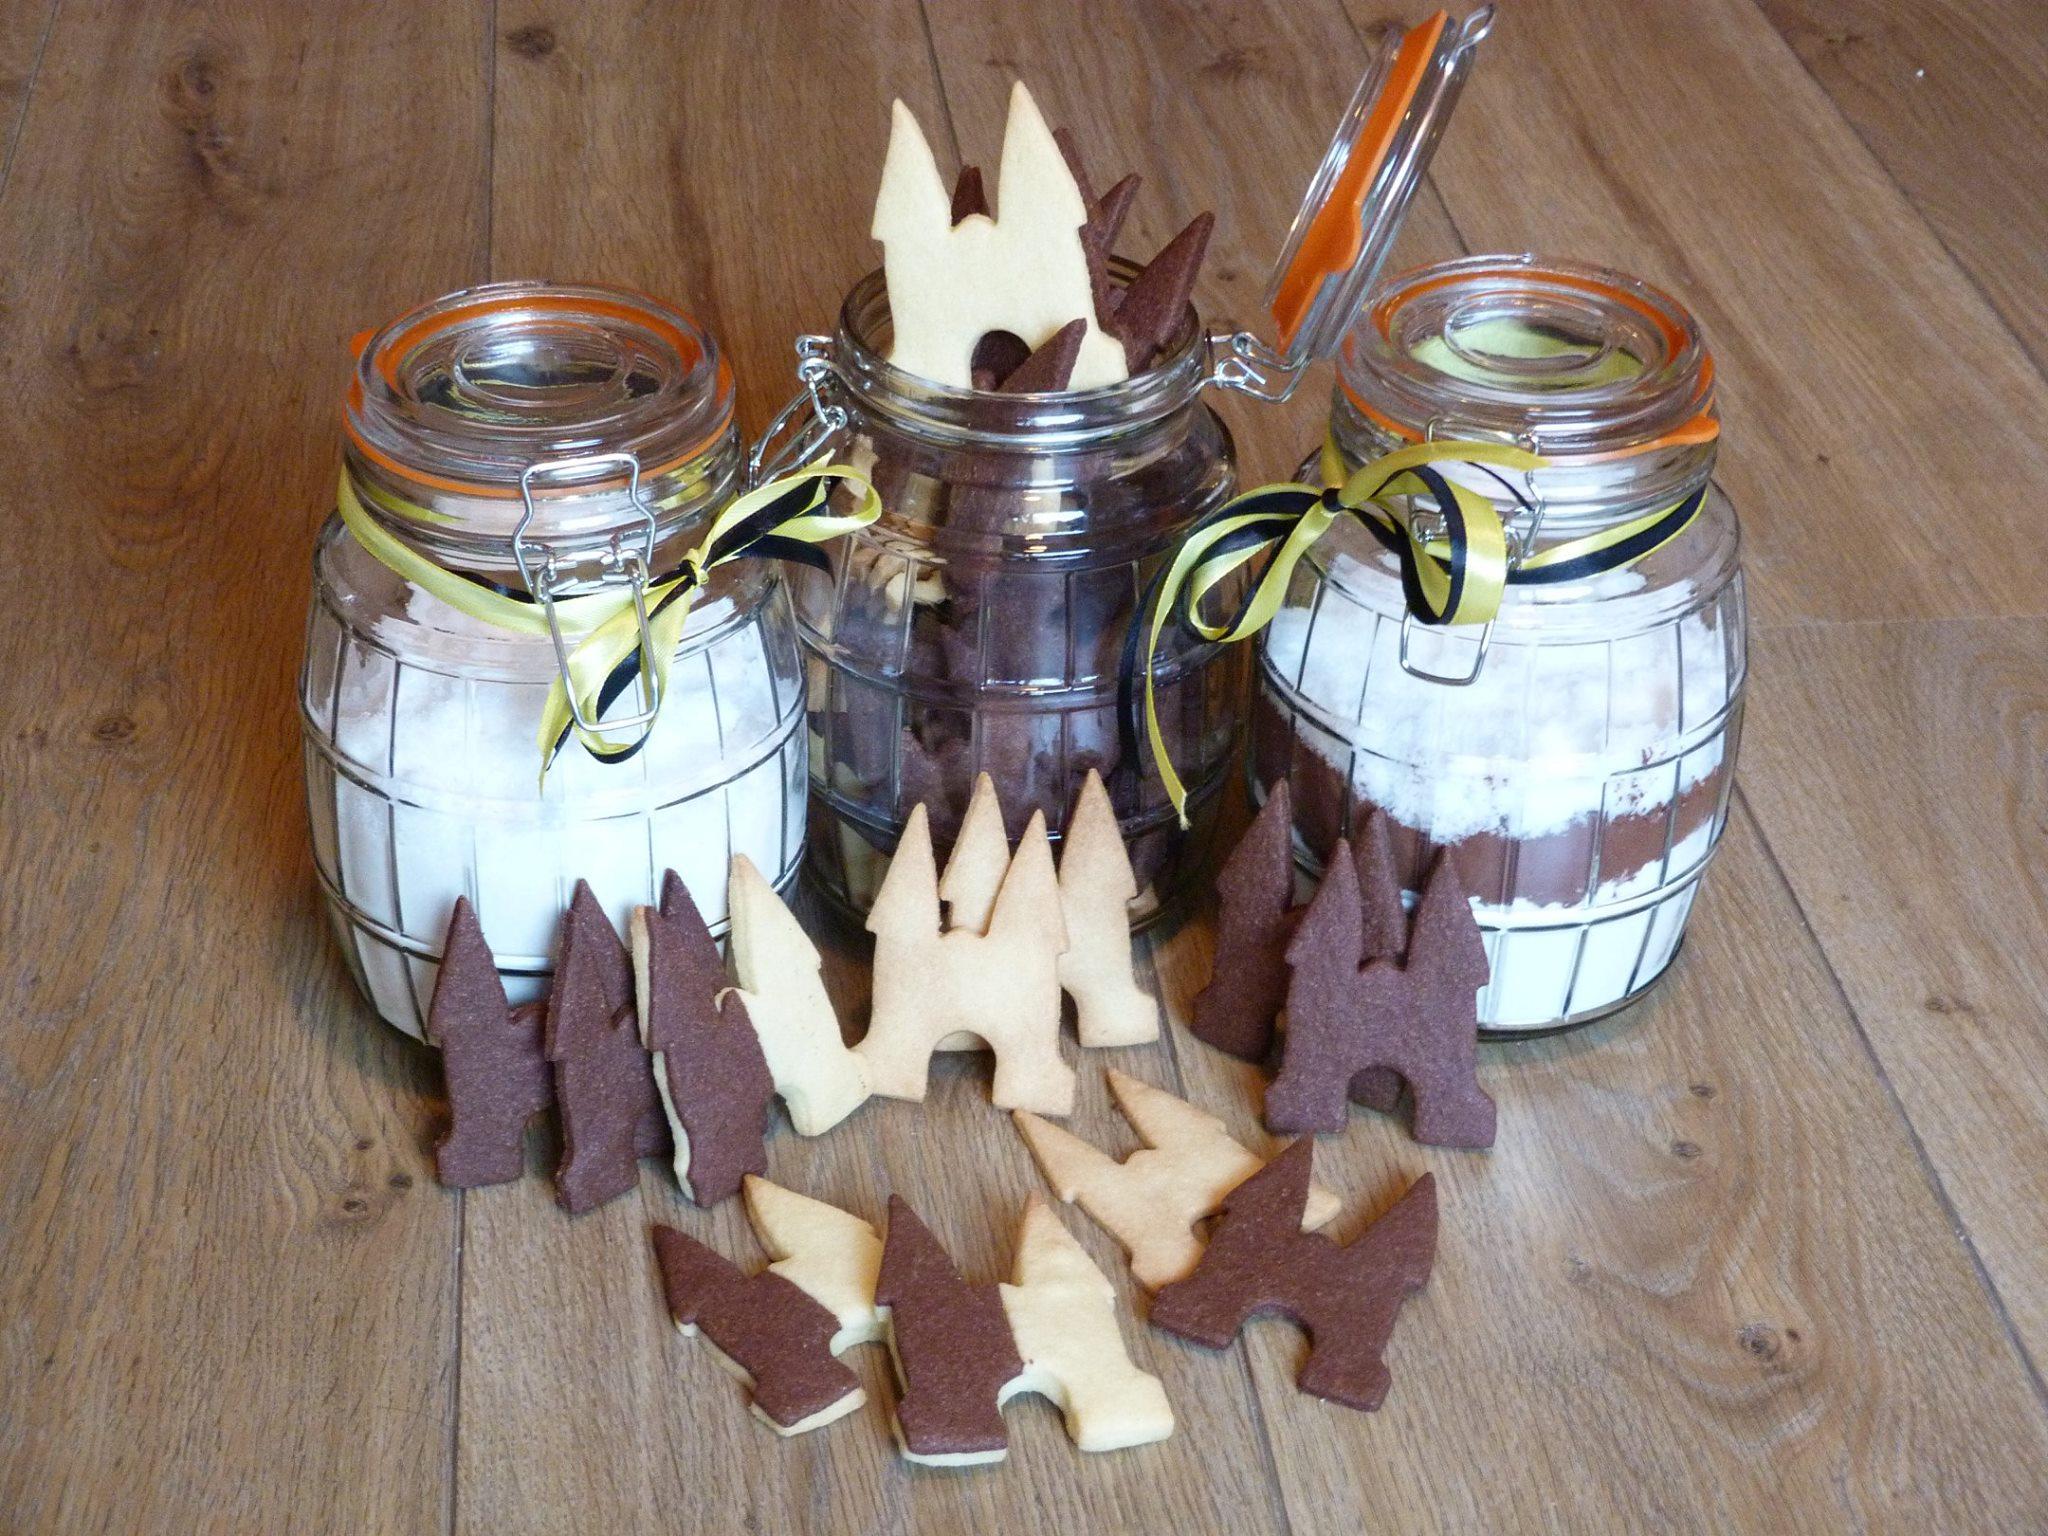 New Pot koekjesmix - uitstekendsneek.nl #NS55